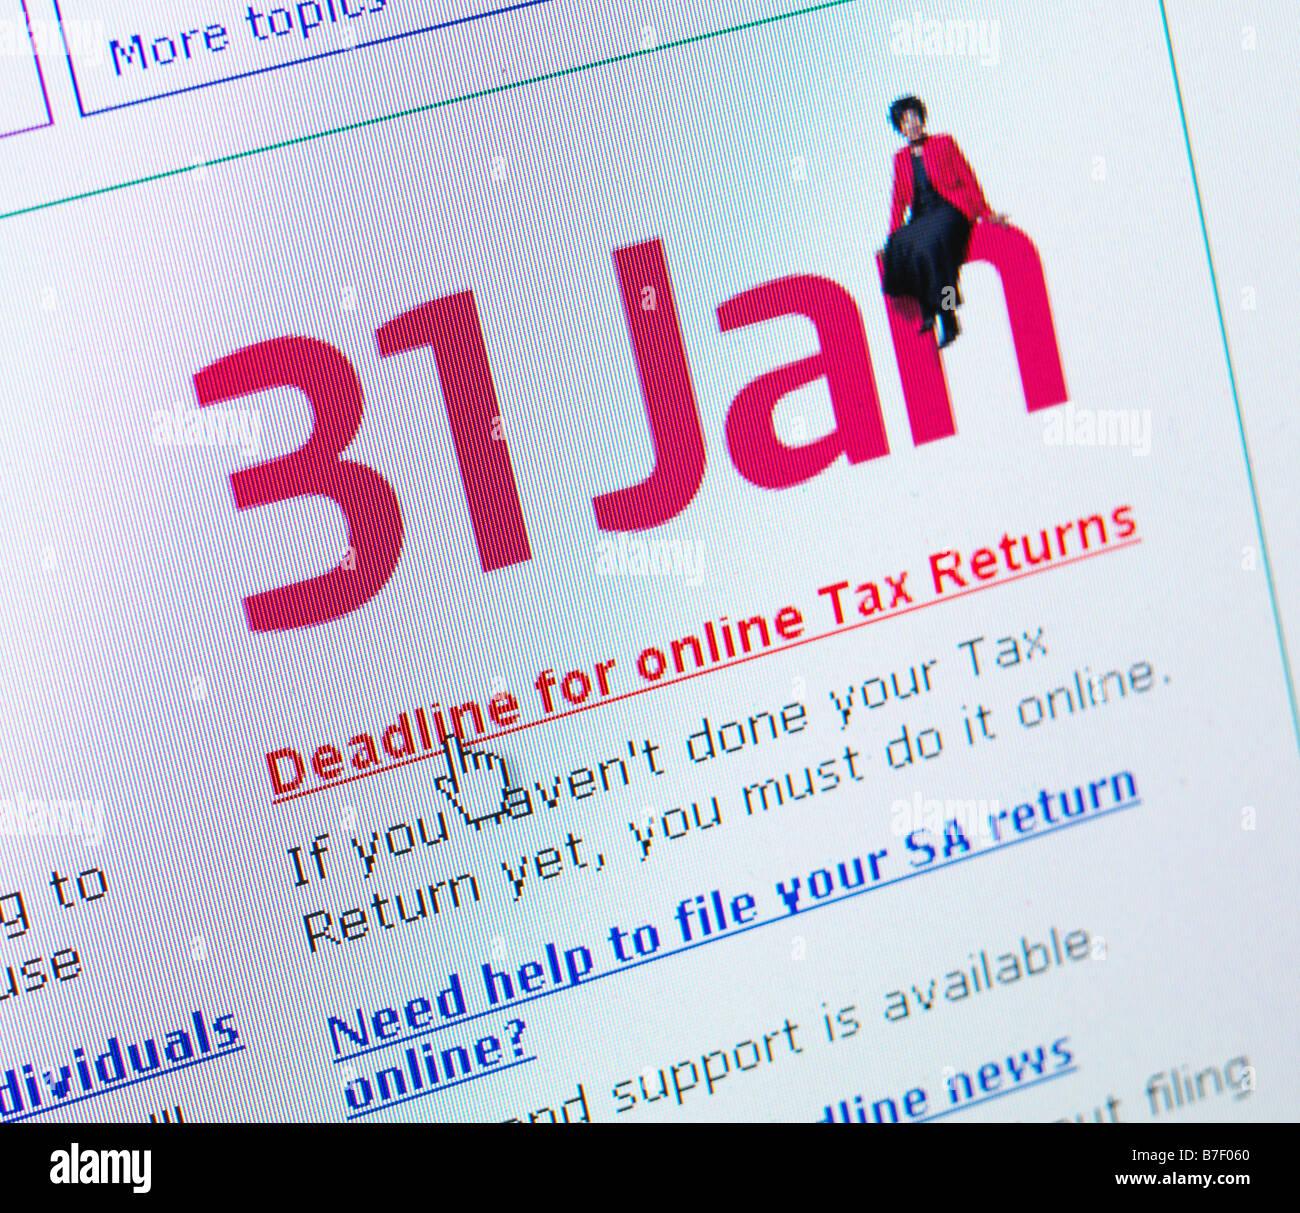 INLAND REVENUE JANUARY 31 TAX RETURN DEADLINE SELF ASSESSMENT - Stock Image